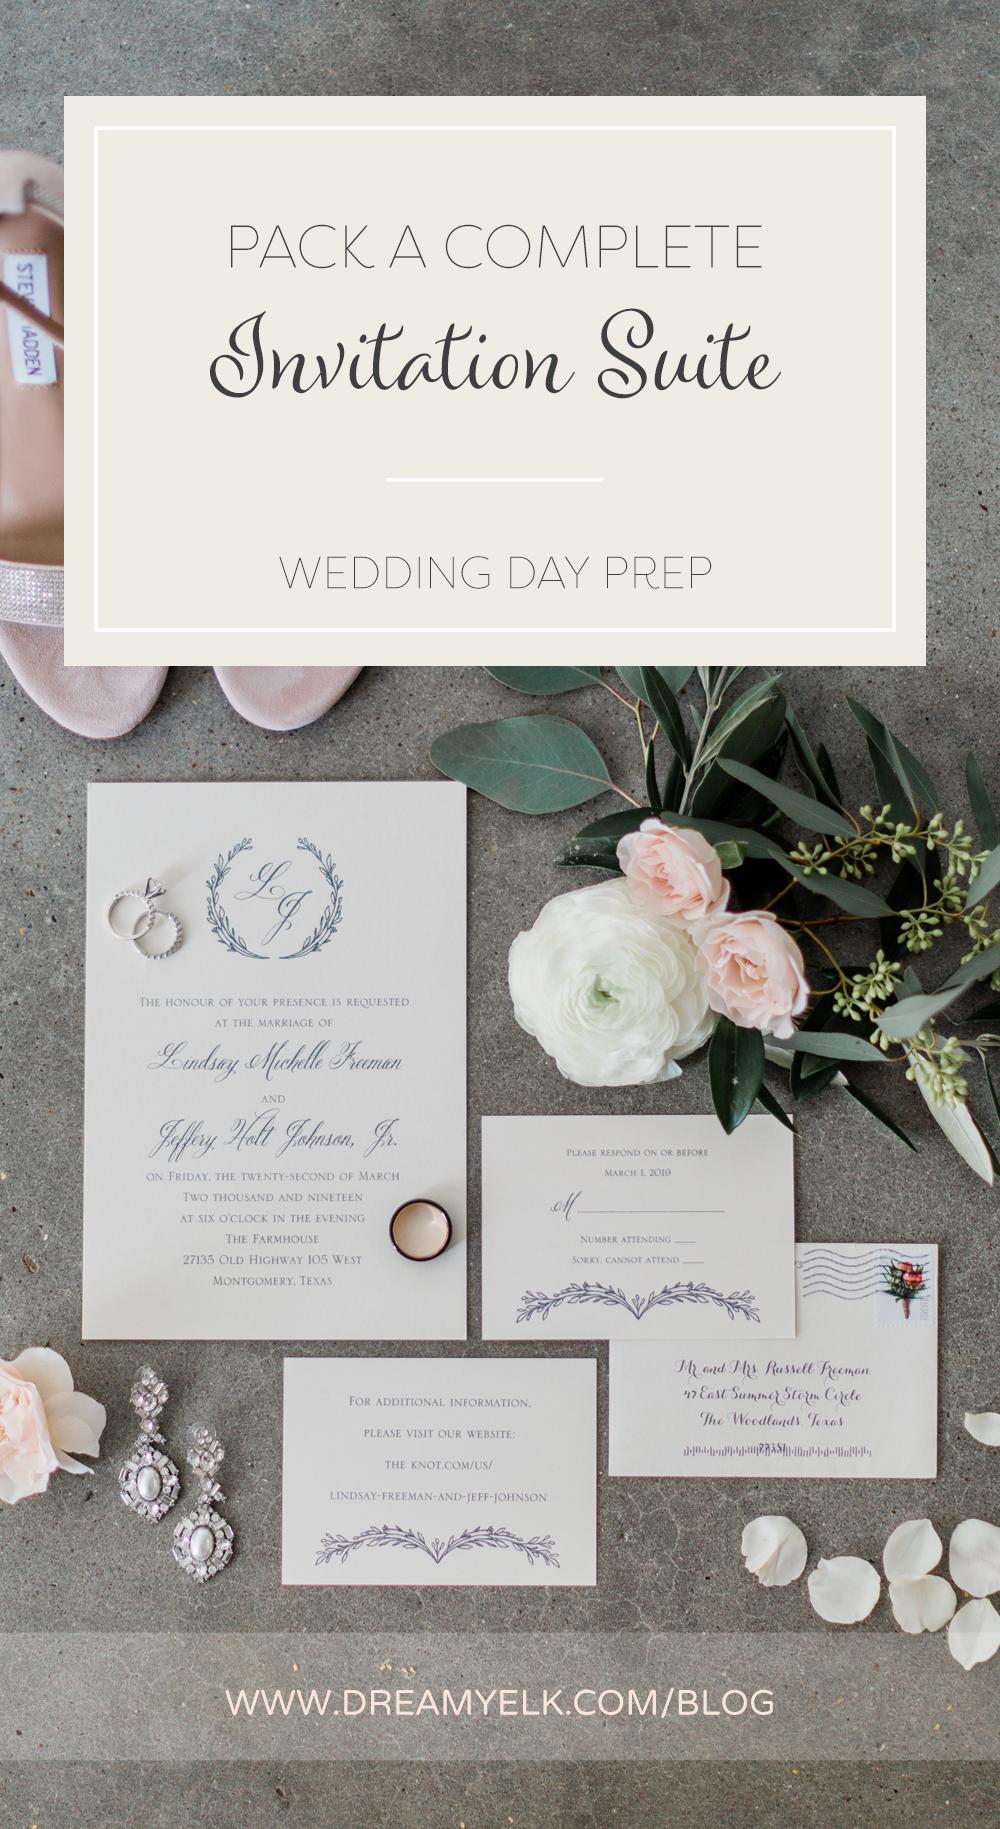 pack a complete invitation suite — Dreamy Elk Photography & Design, LLC